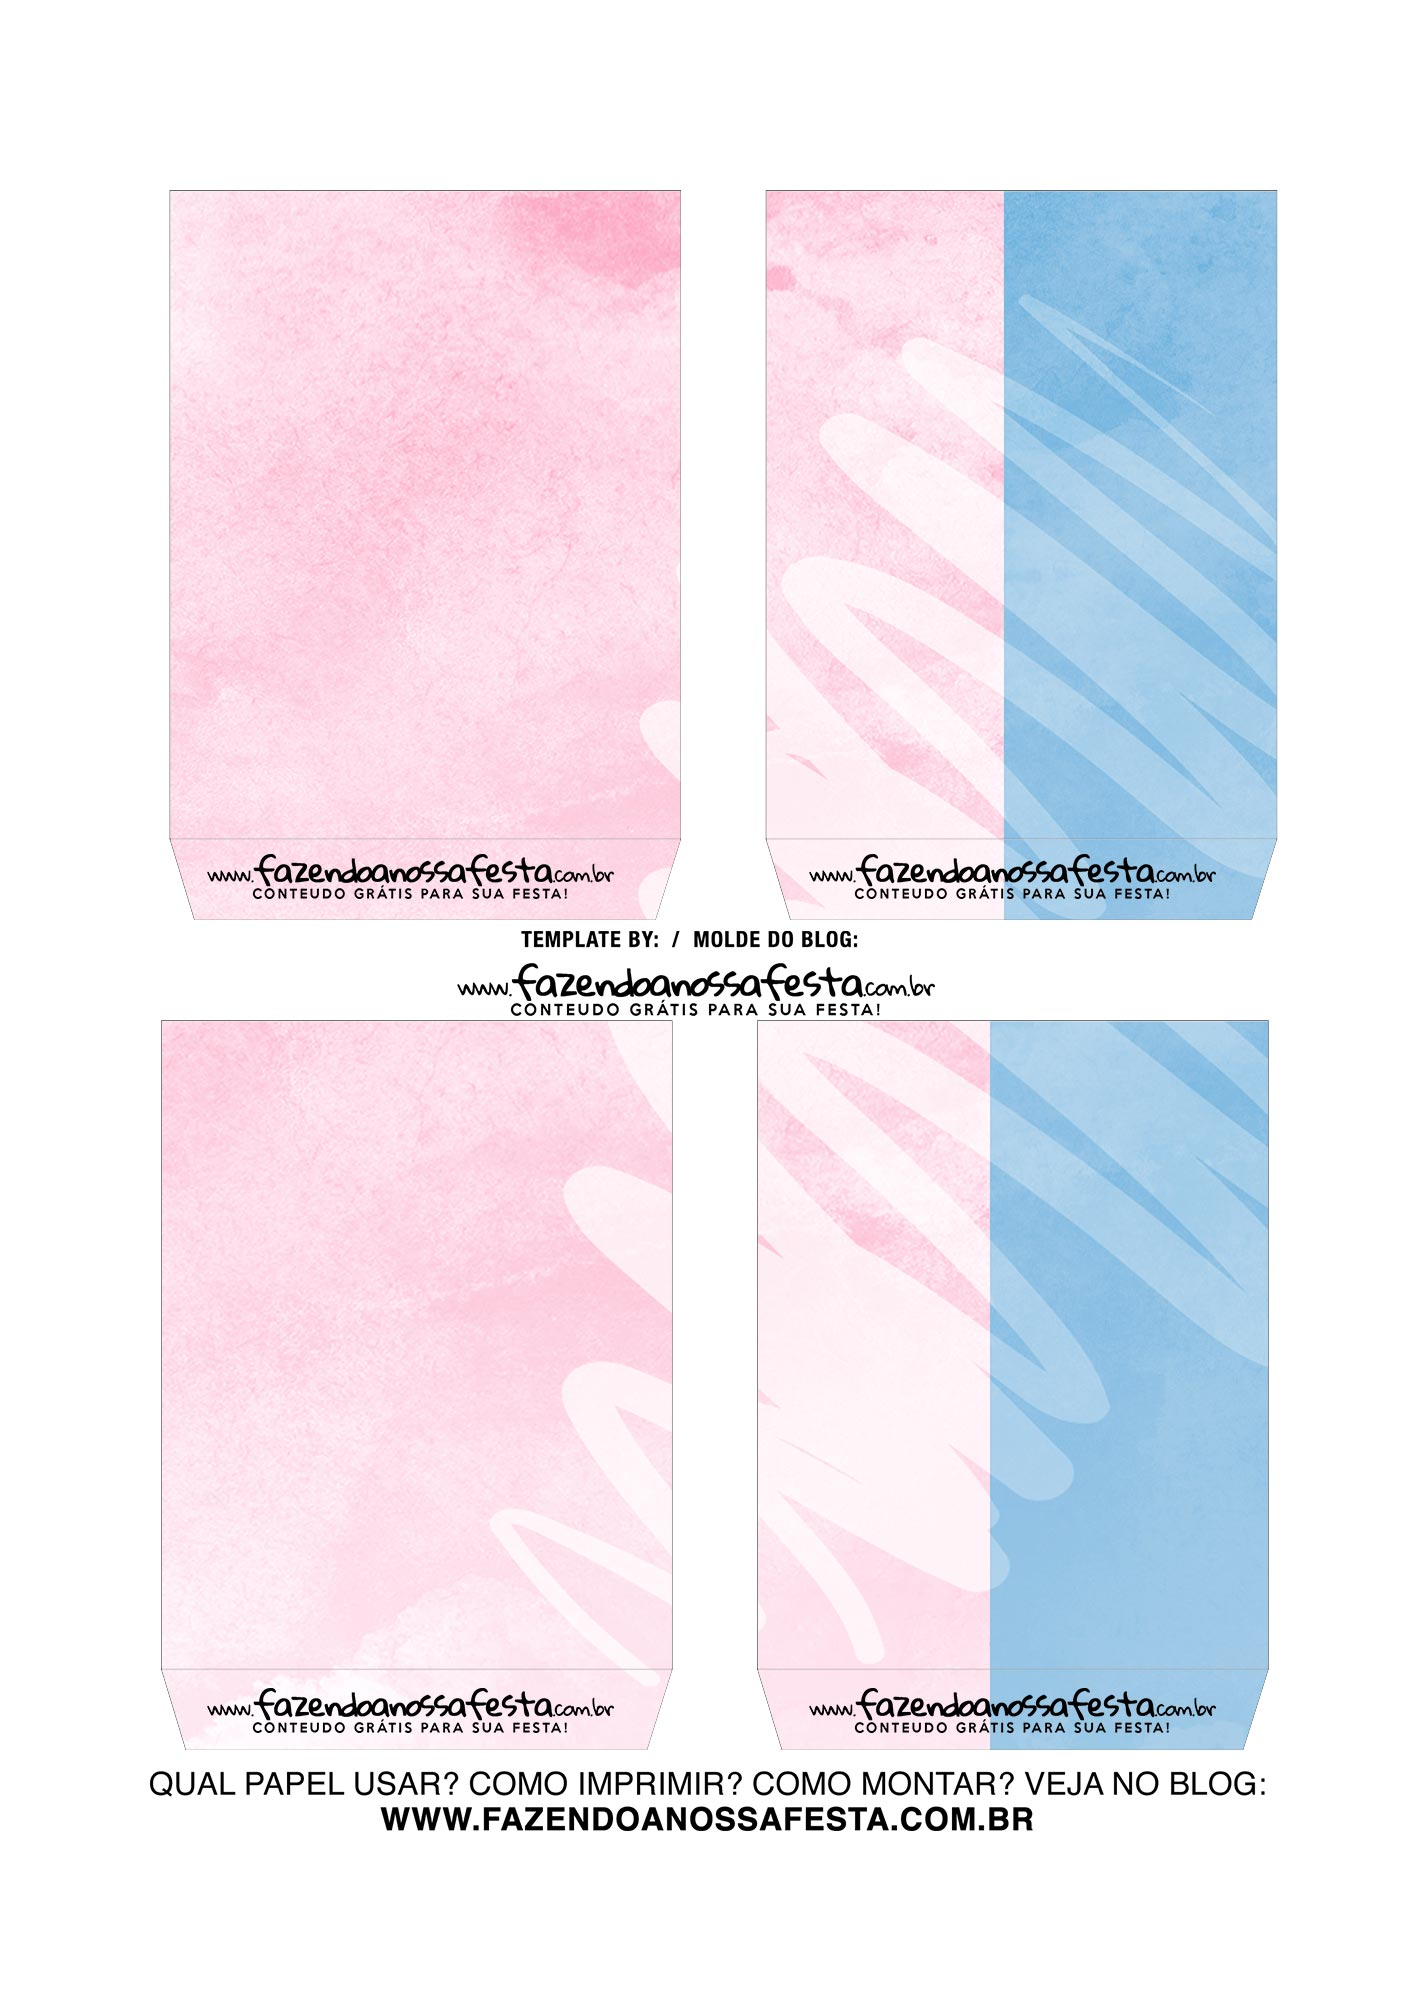 Caixa Explosiva Dia dos Namorados Rosa e Azul 4